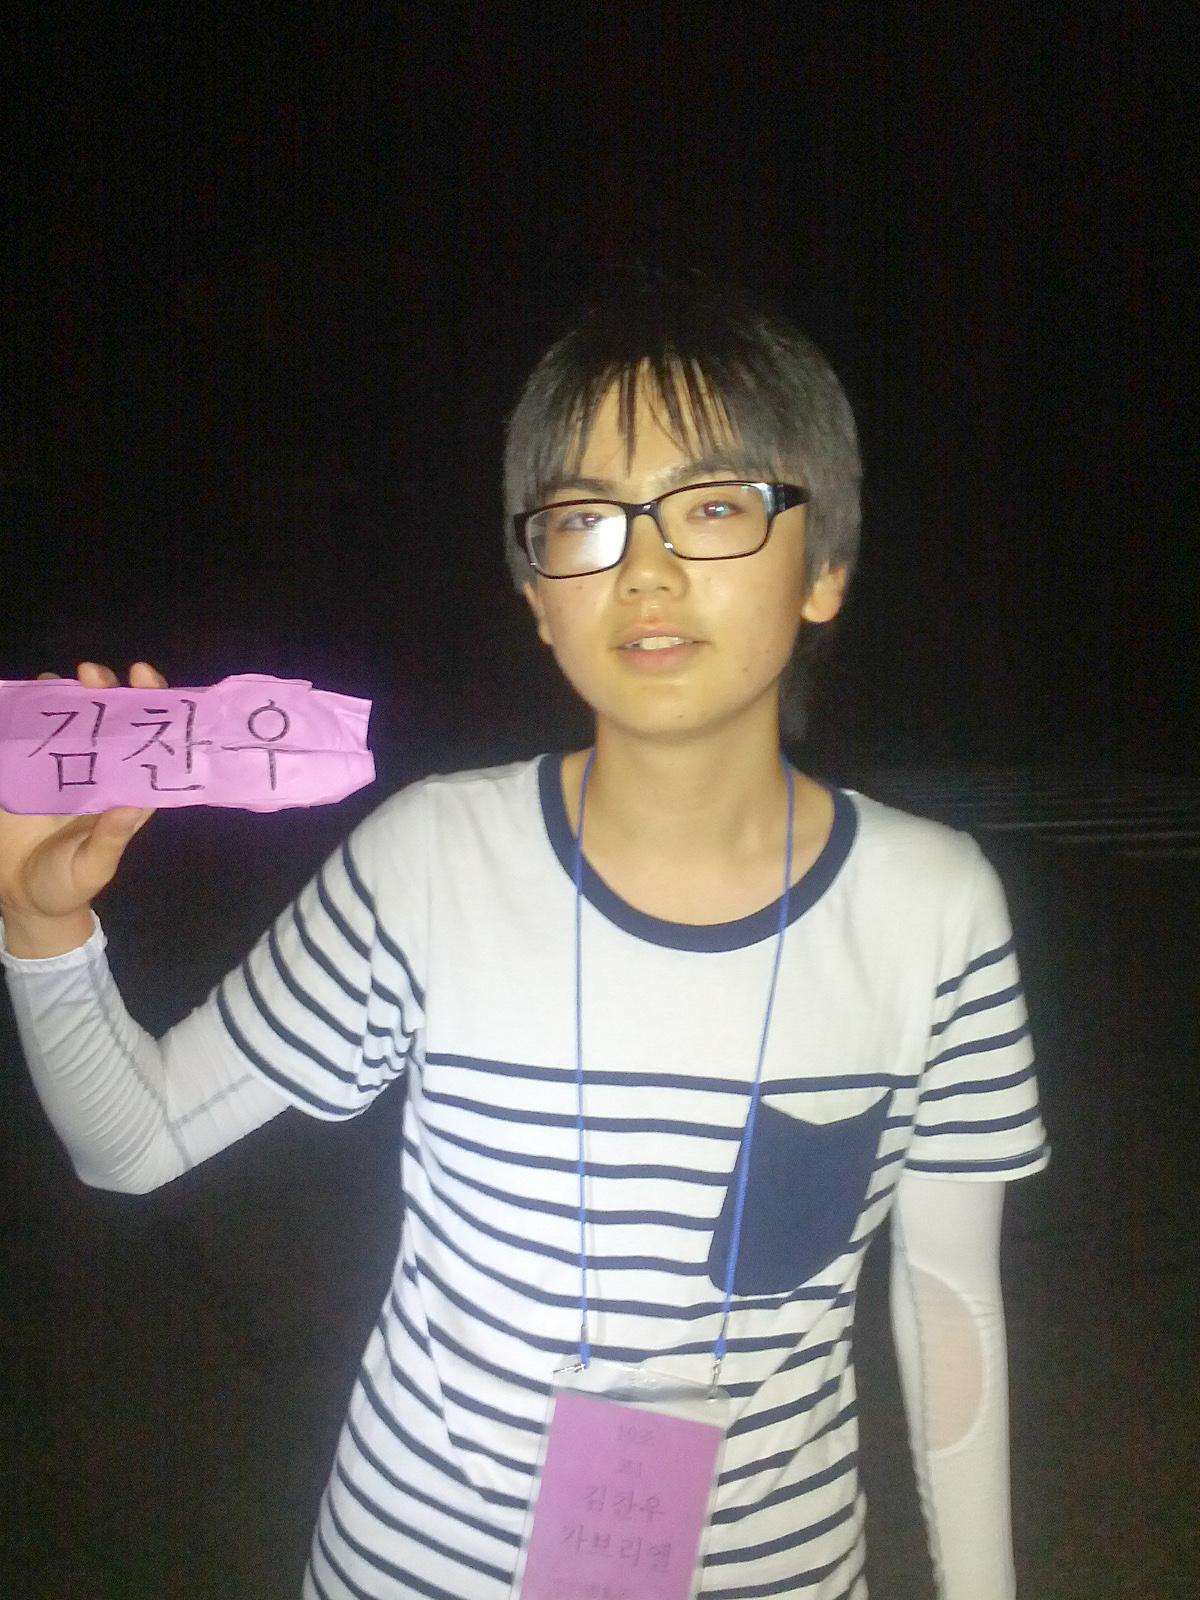 C360_2012-07-27-21-38-09.jpg